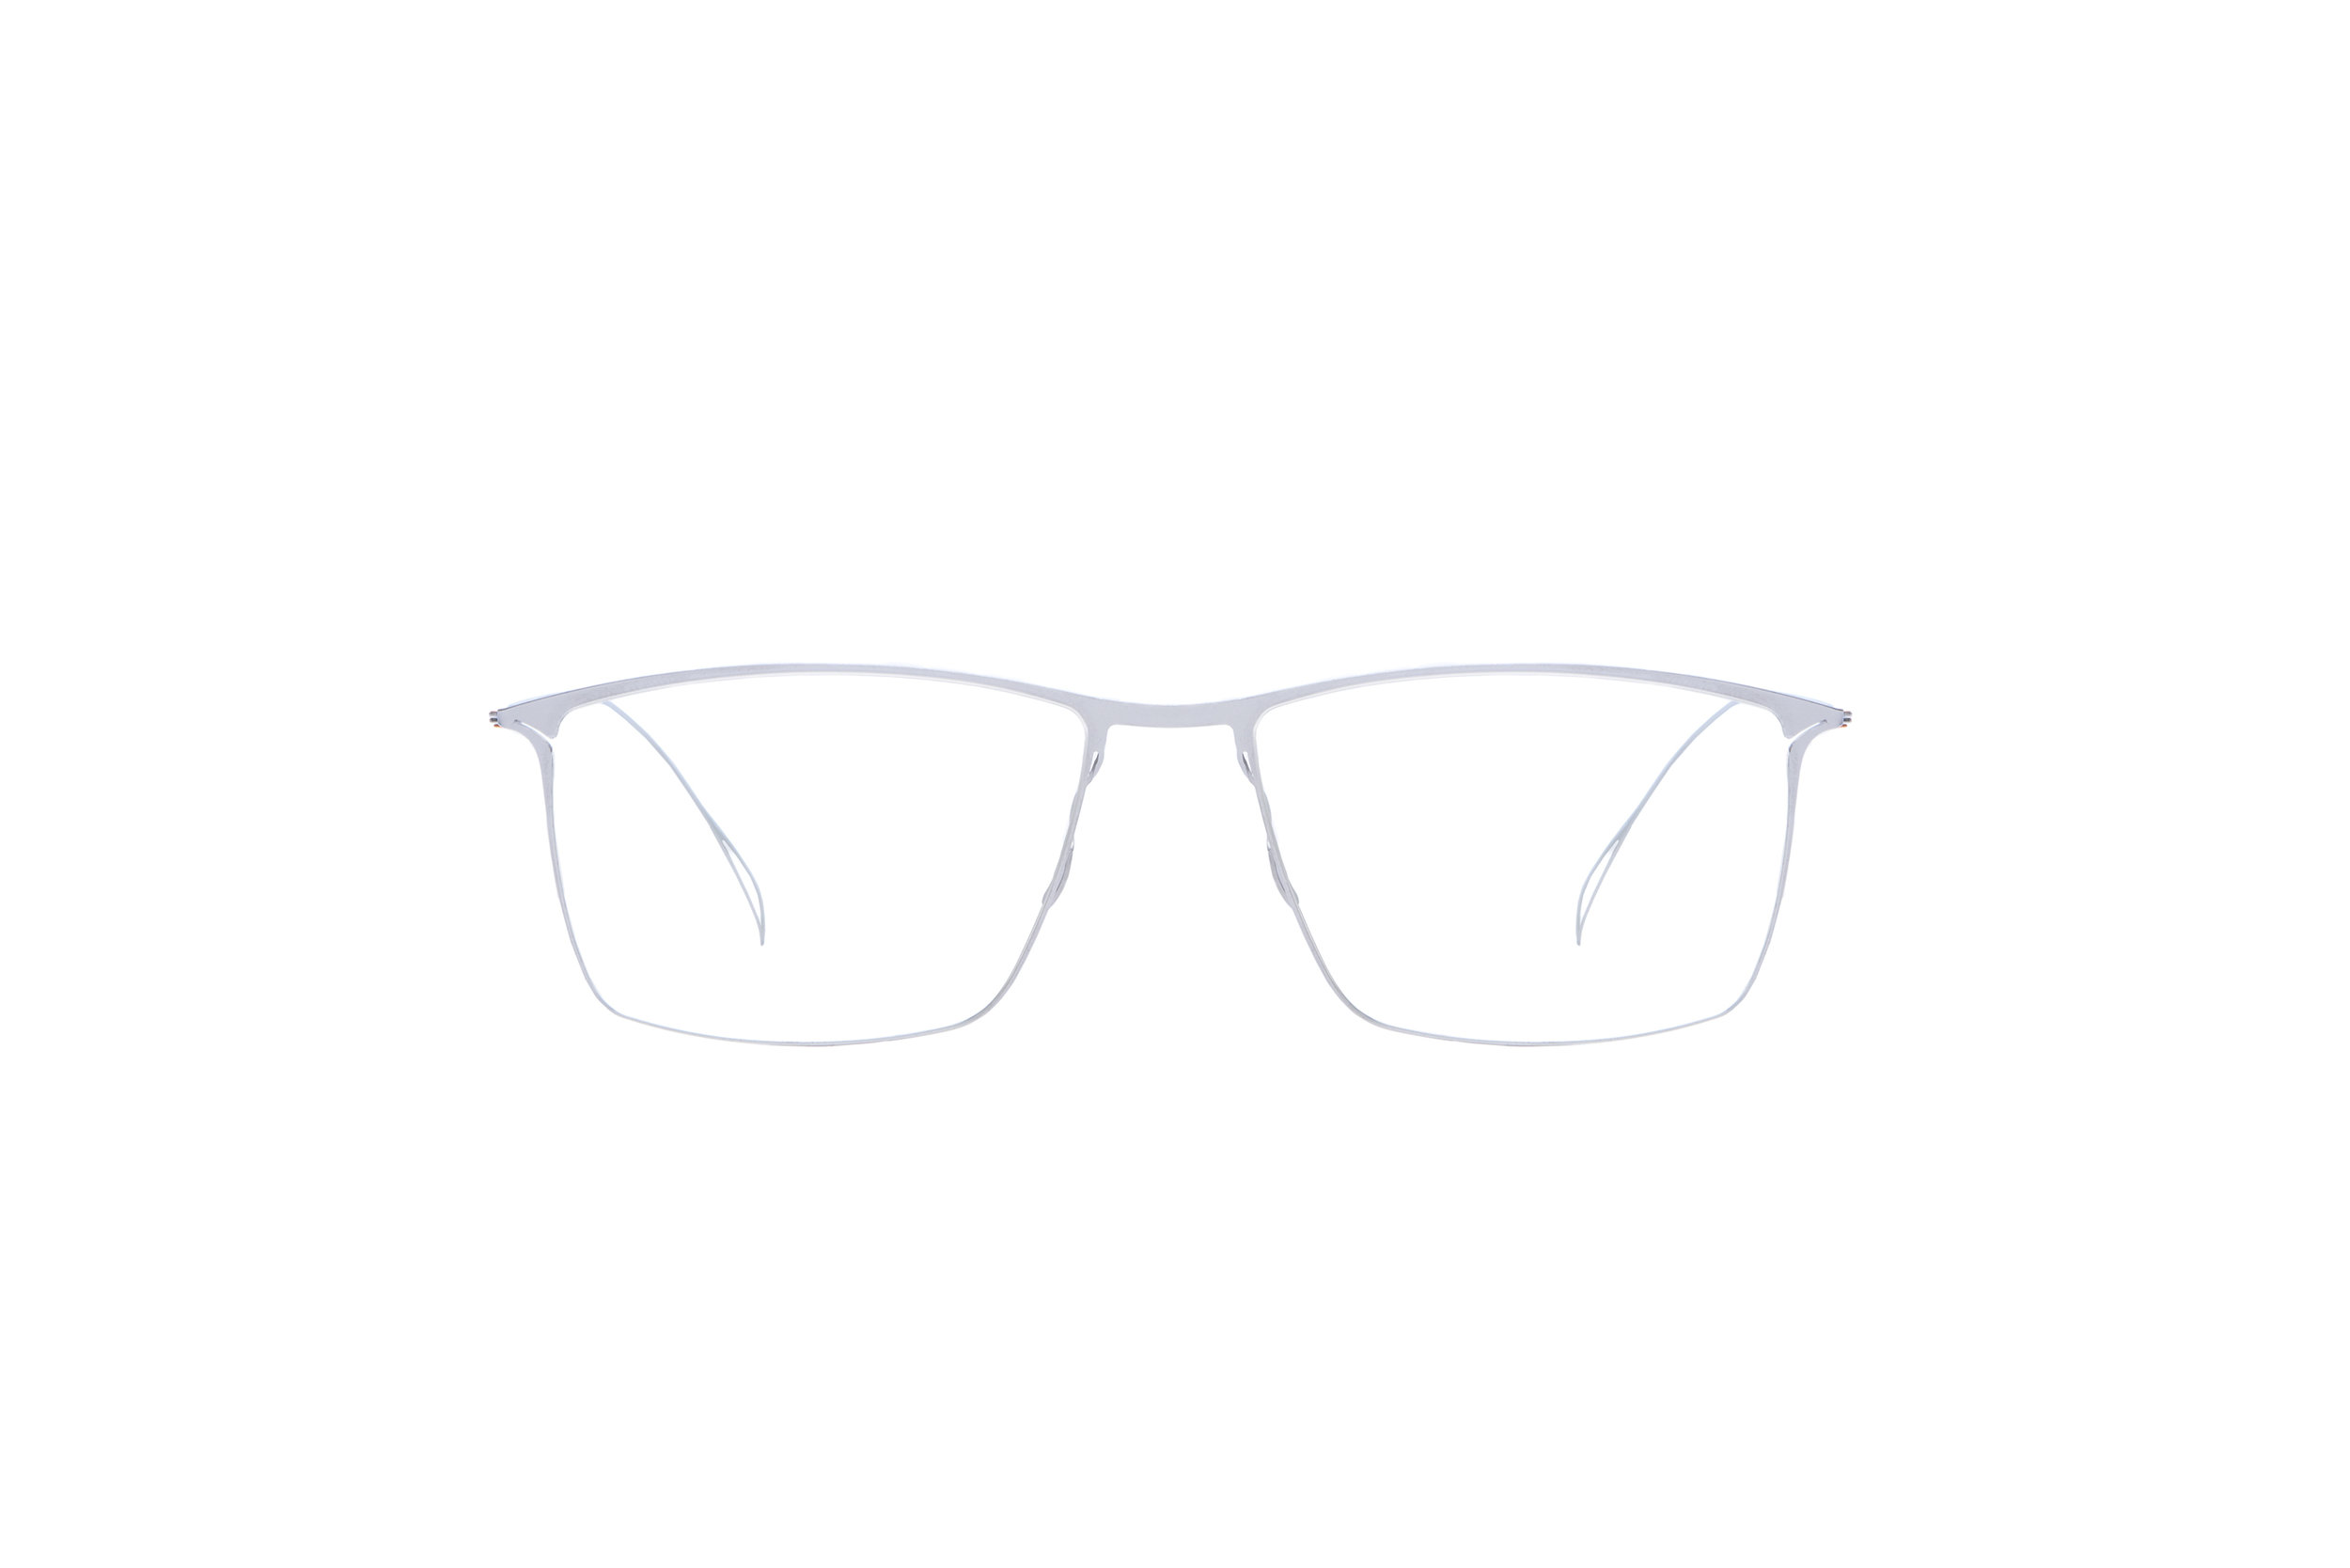 haffmans_neumeister_novik_airstream_clear_ultralight_eyeglasses_front_102446.jpg